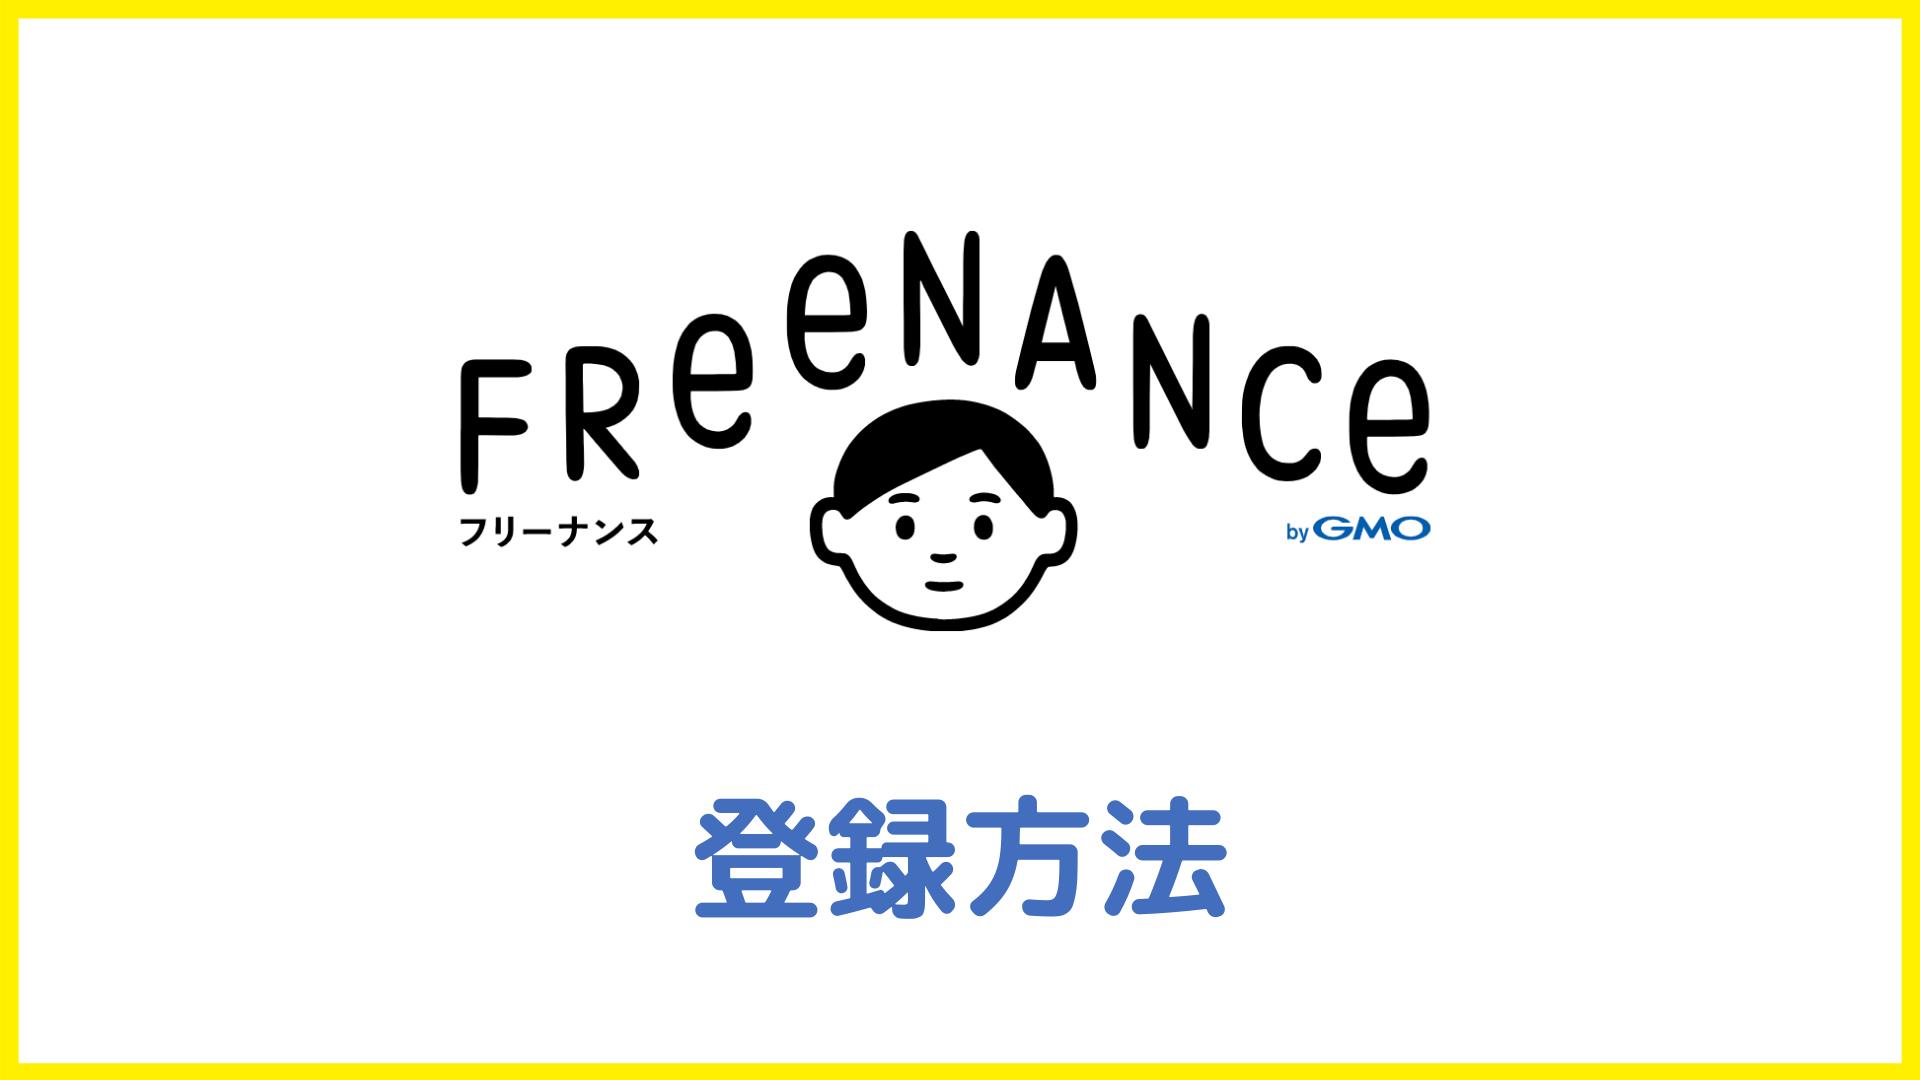 FREENANCE(フリーナンス)の登録方法